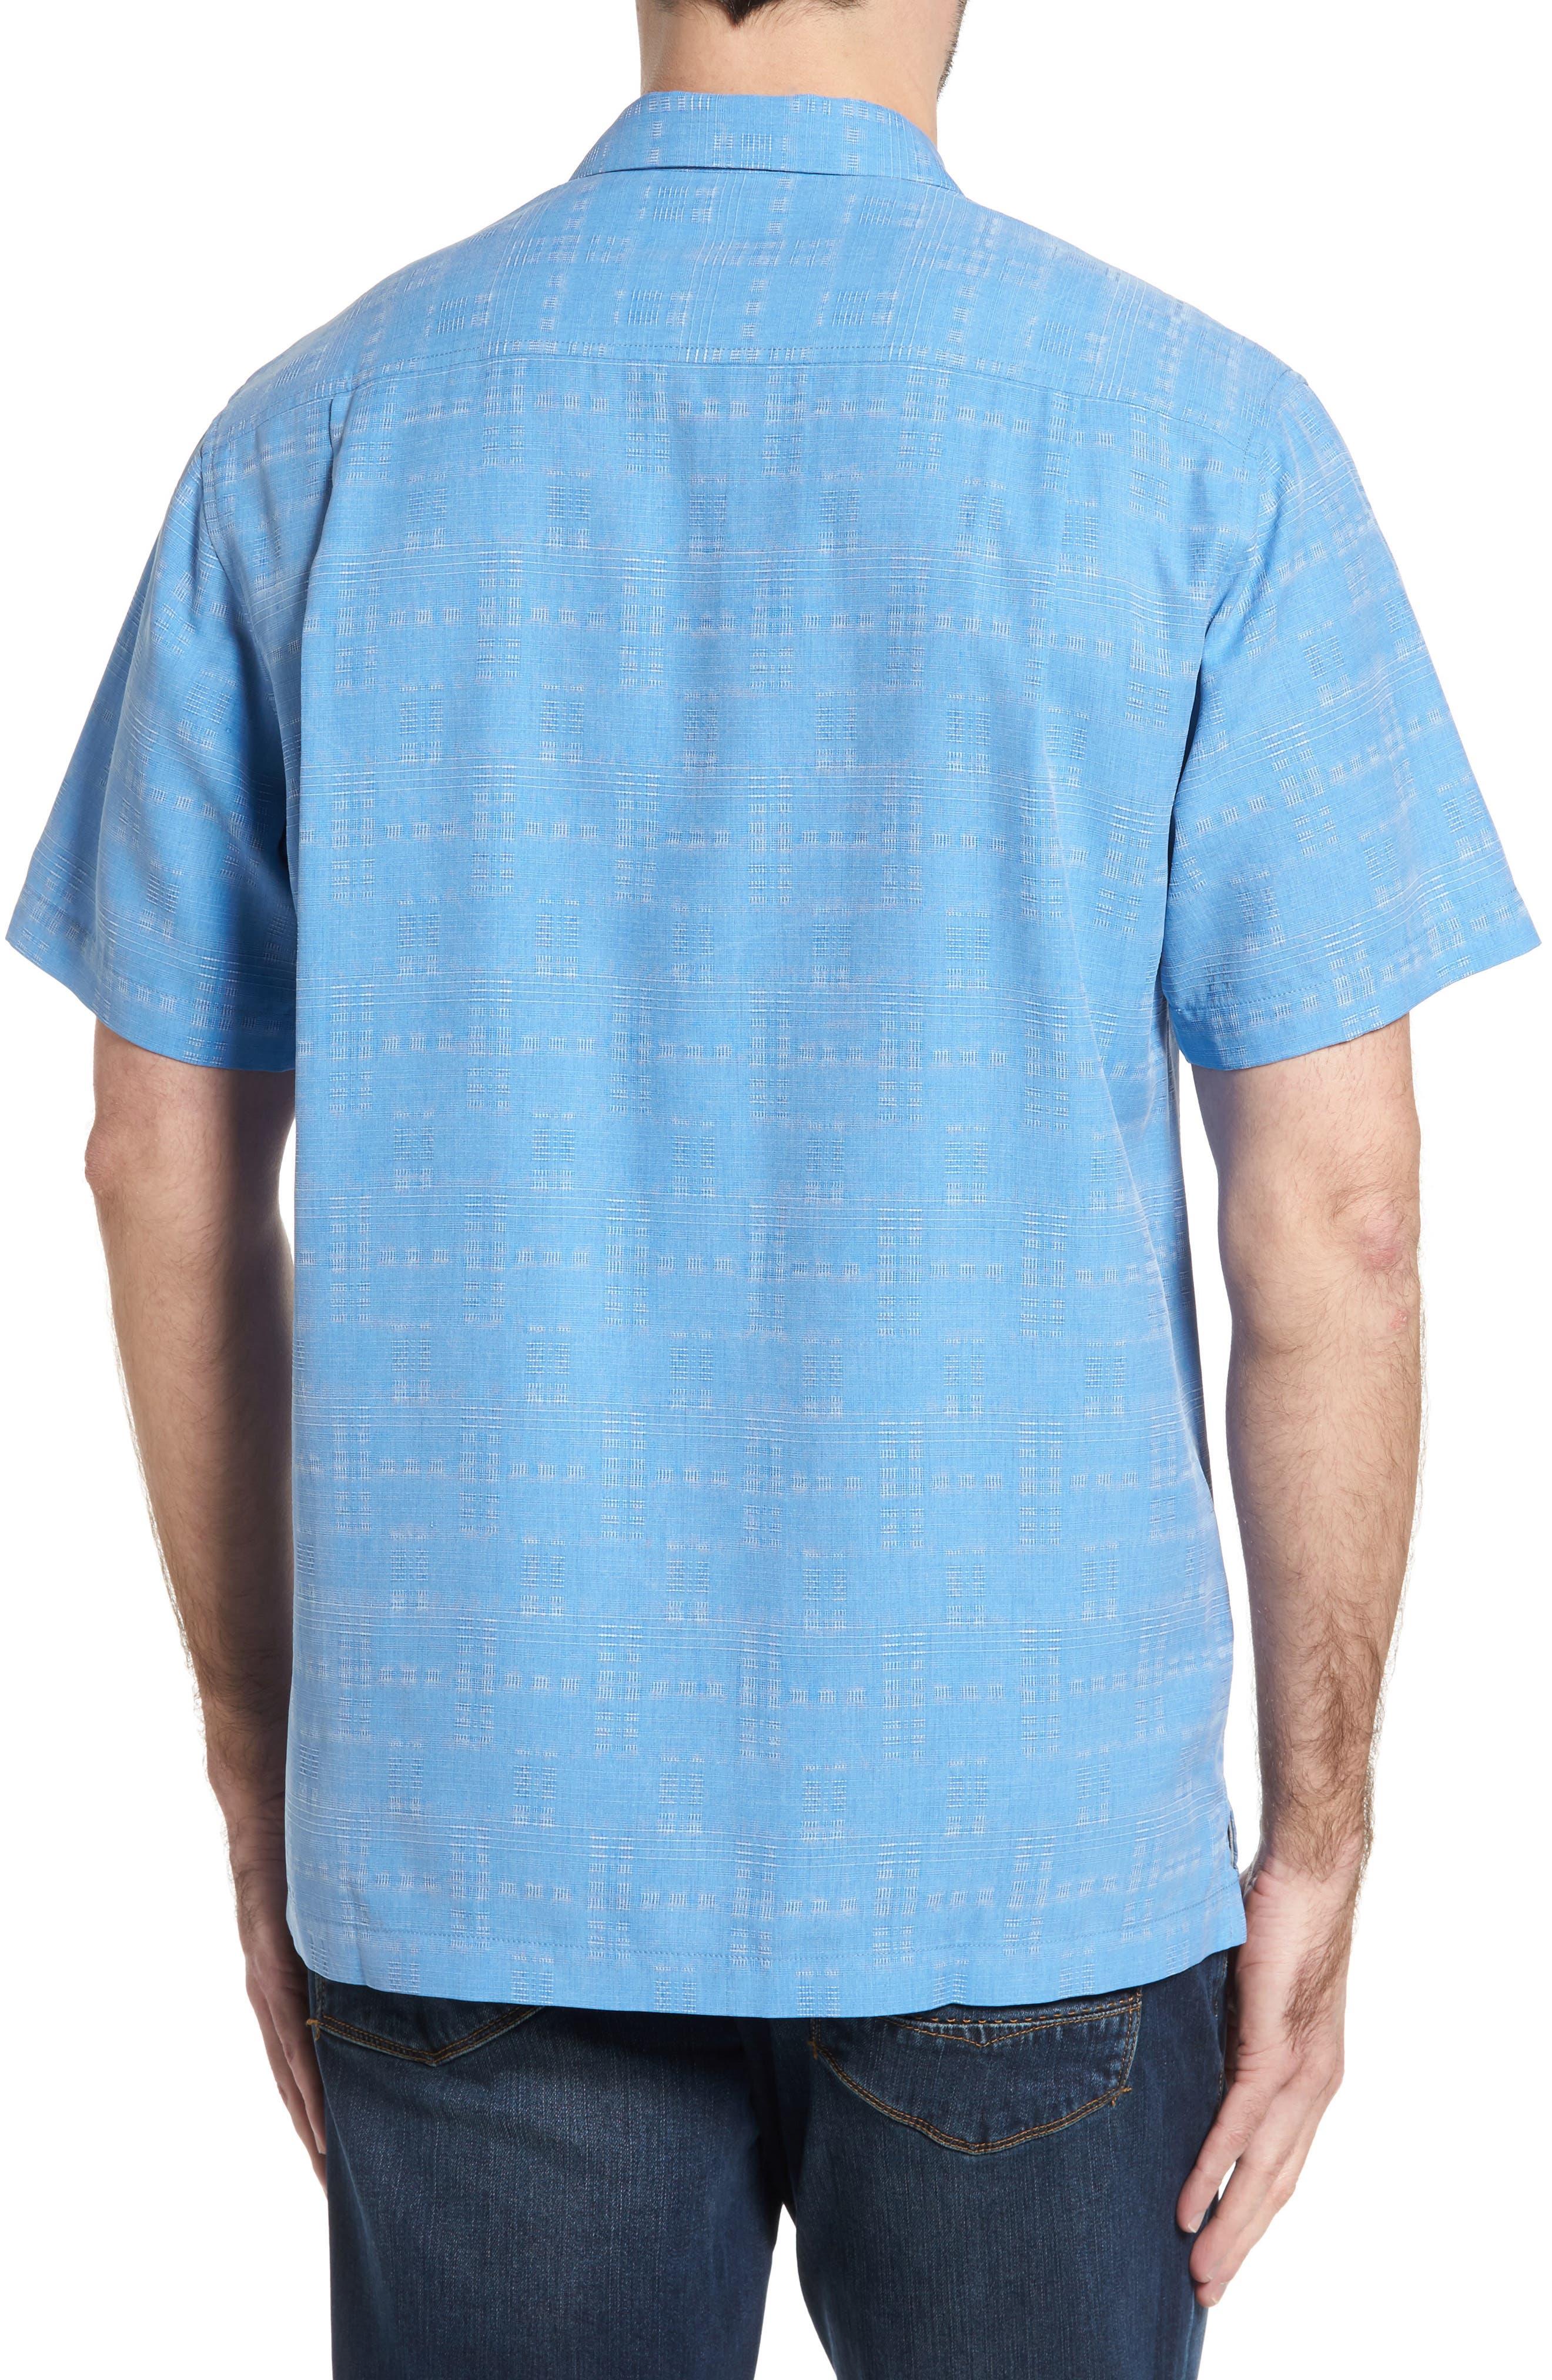 Alternate Image 2  - Tommy Bahama Original Fit Jacquard Silk Camp Shirt